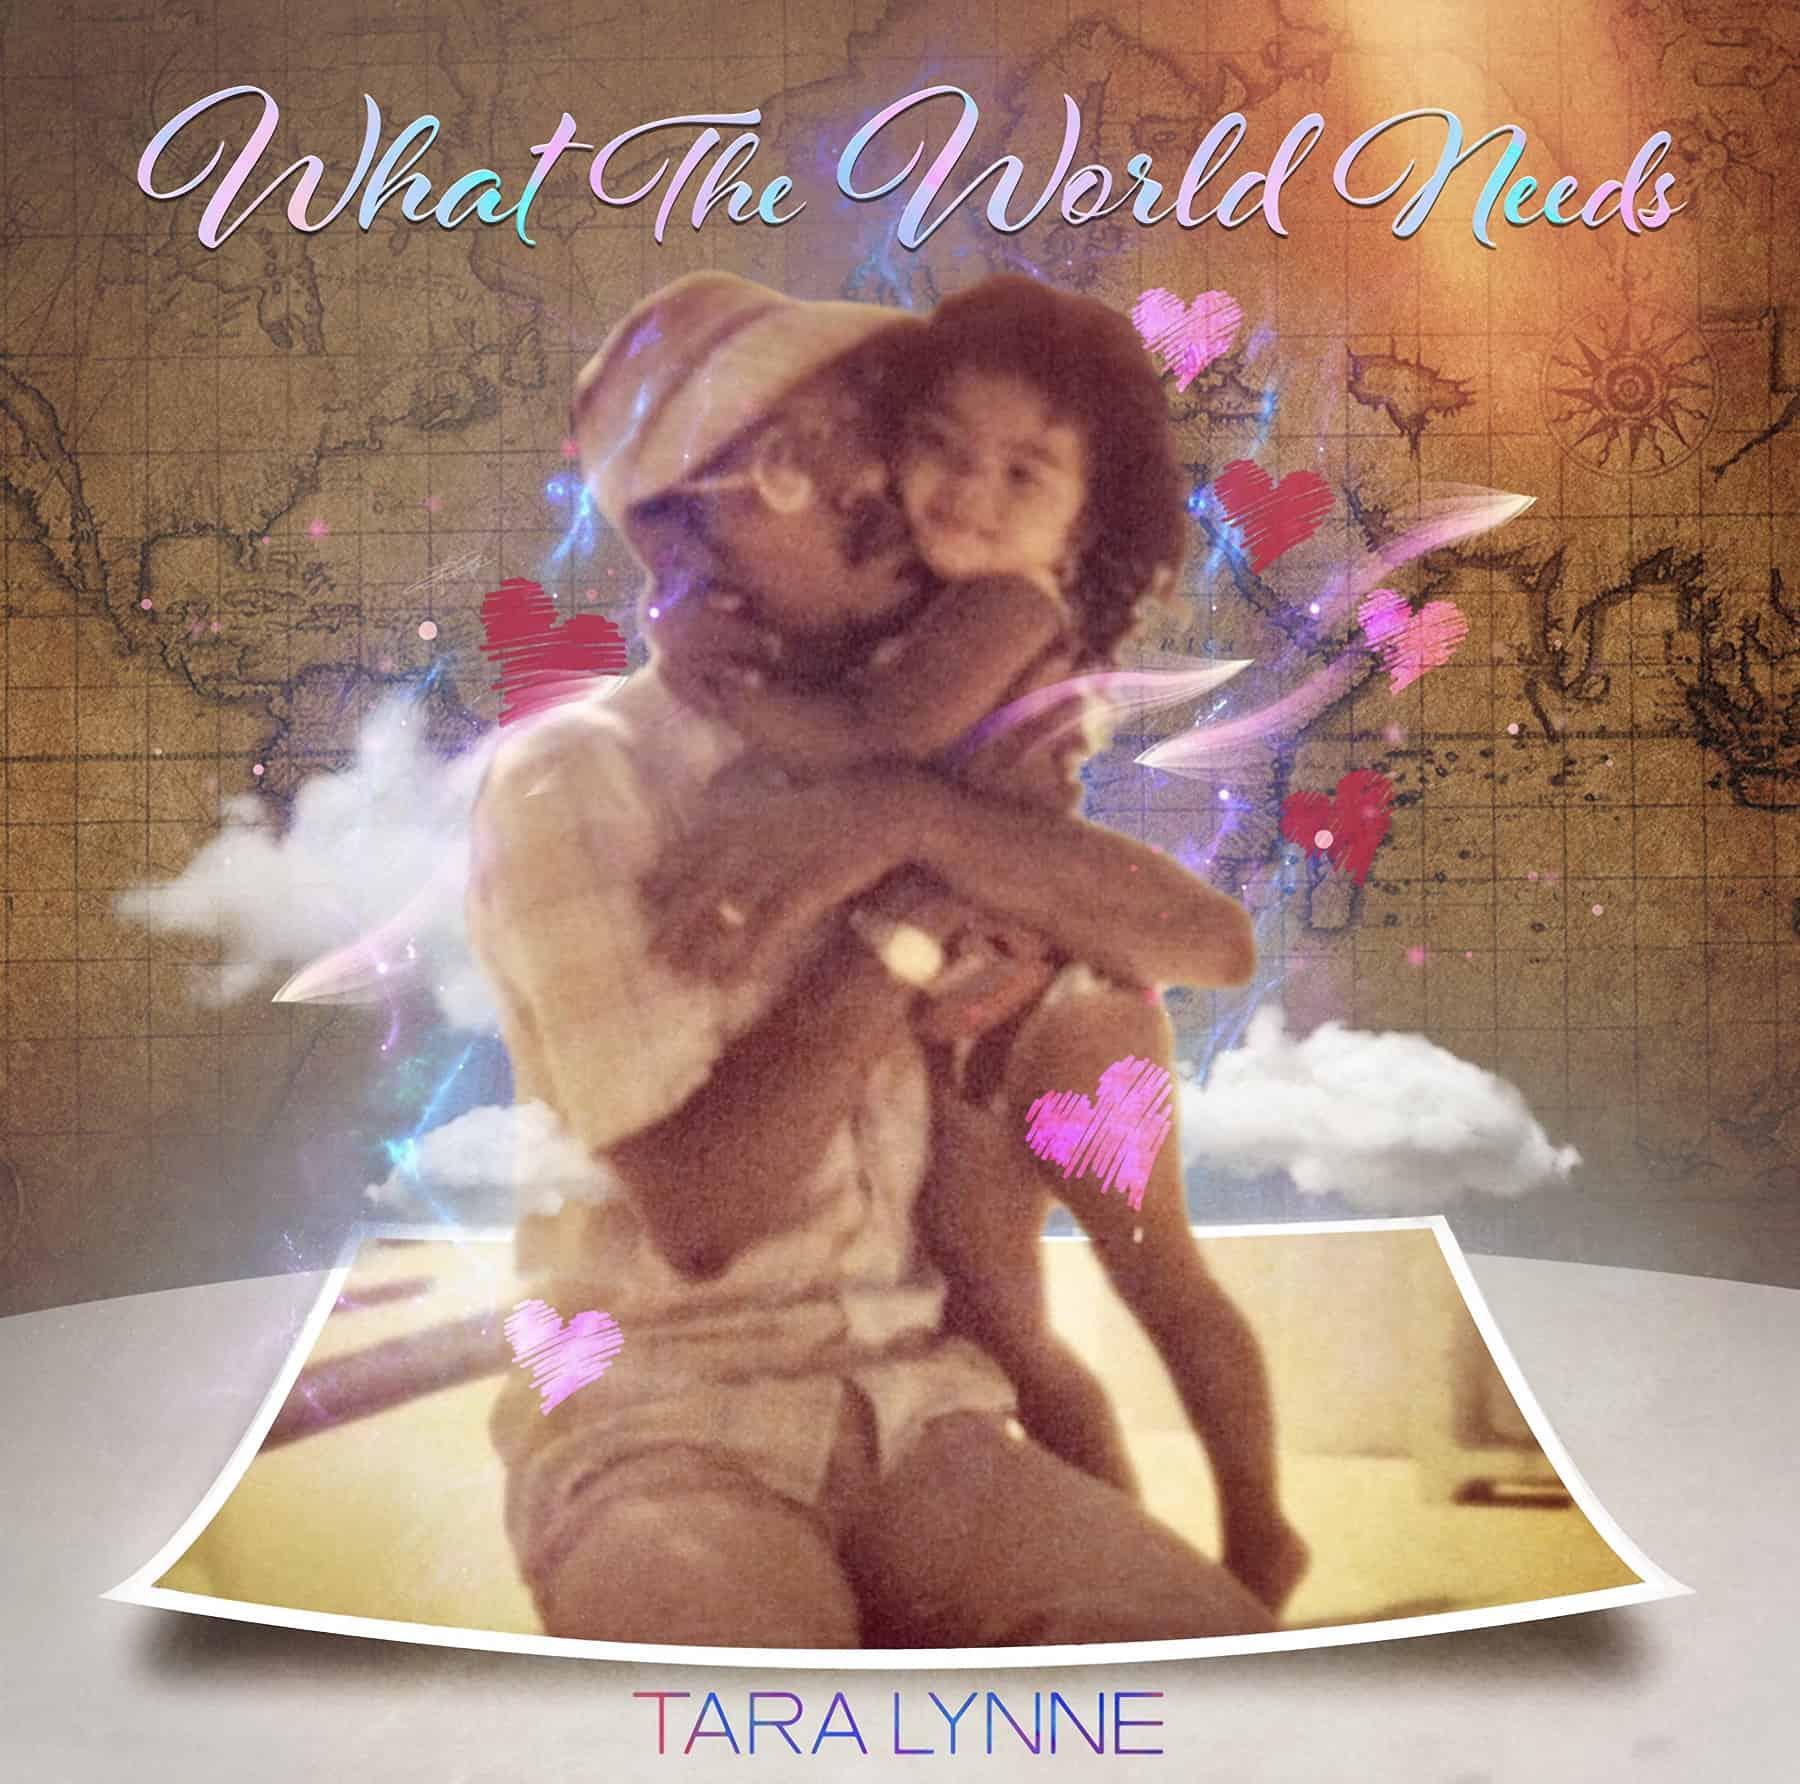 Tara Lynne - What The World Needs